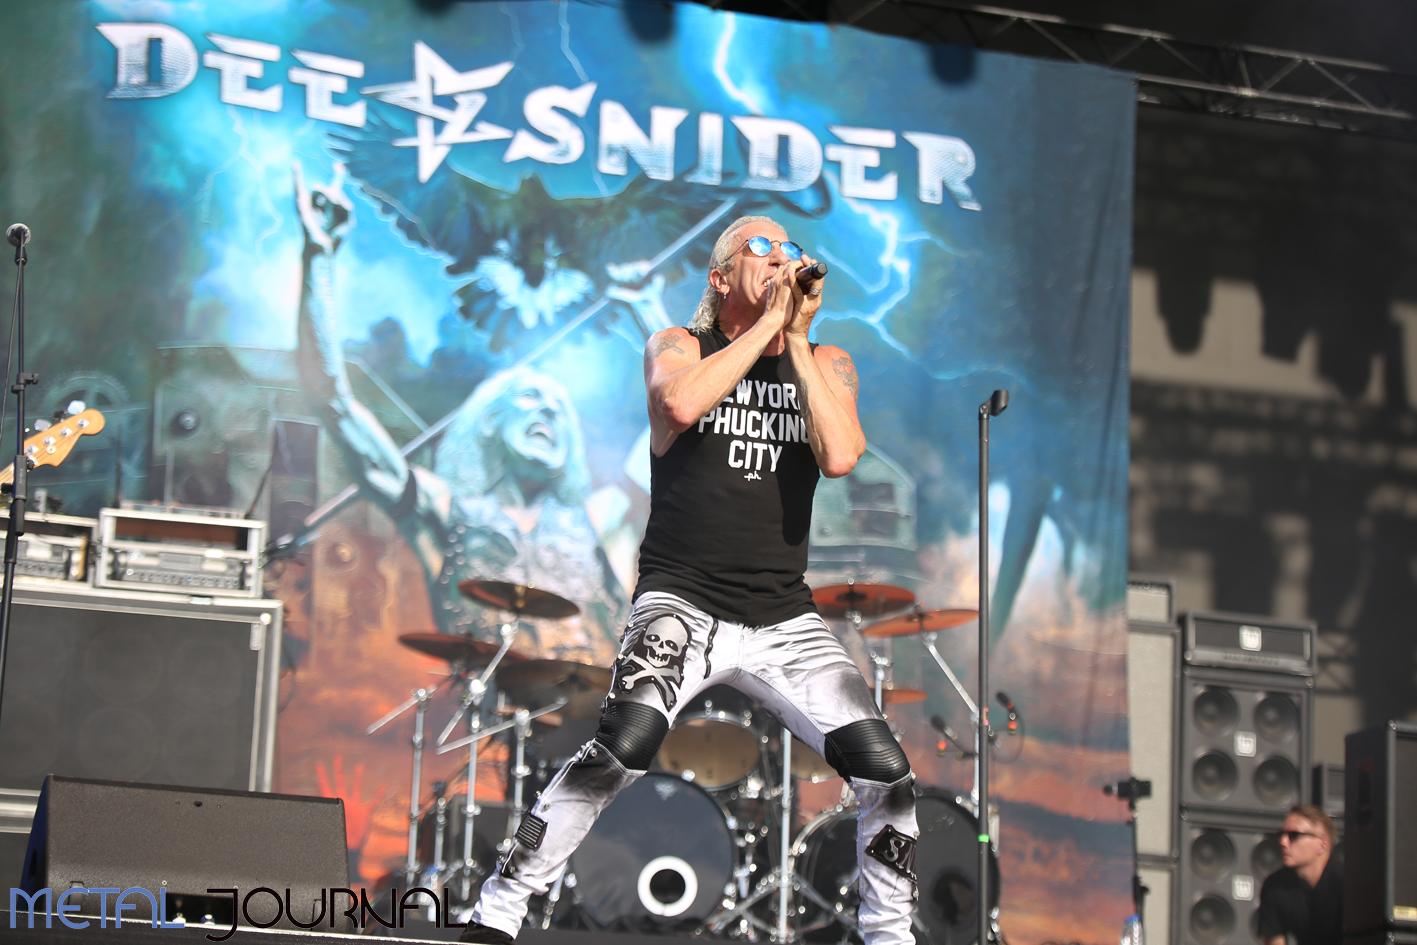 dee snider rock fest 18 - metal journal pic 5